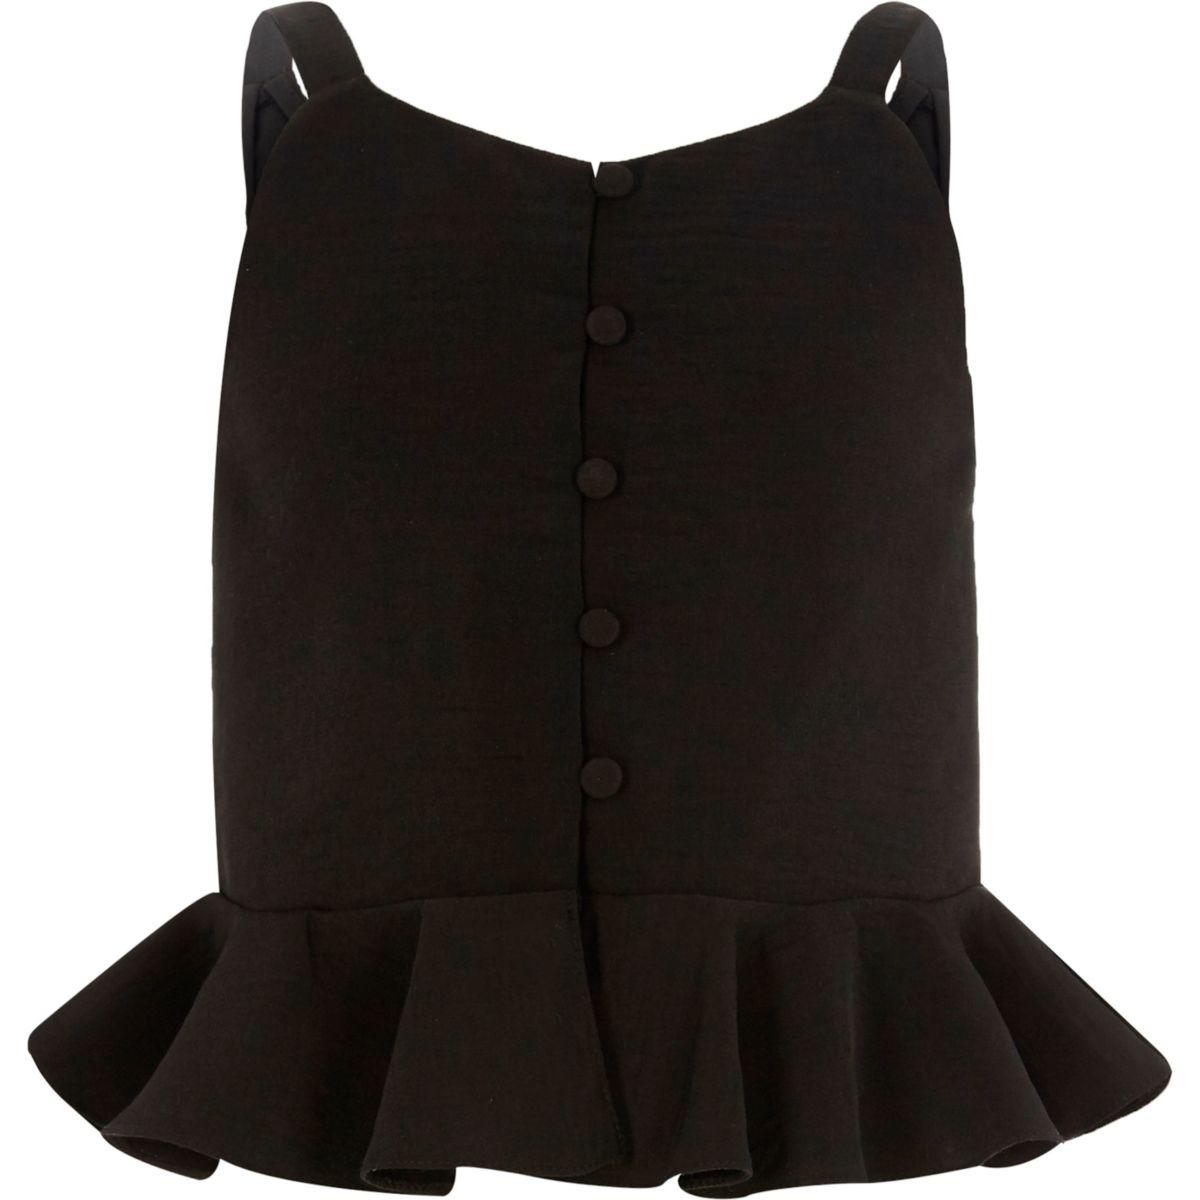 Girls black peplum cami top